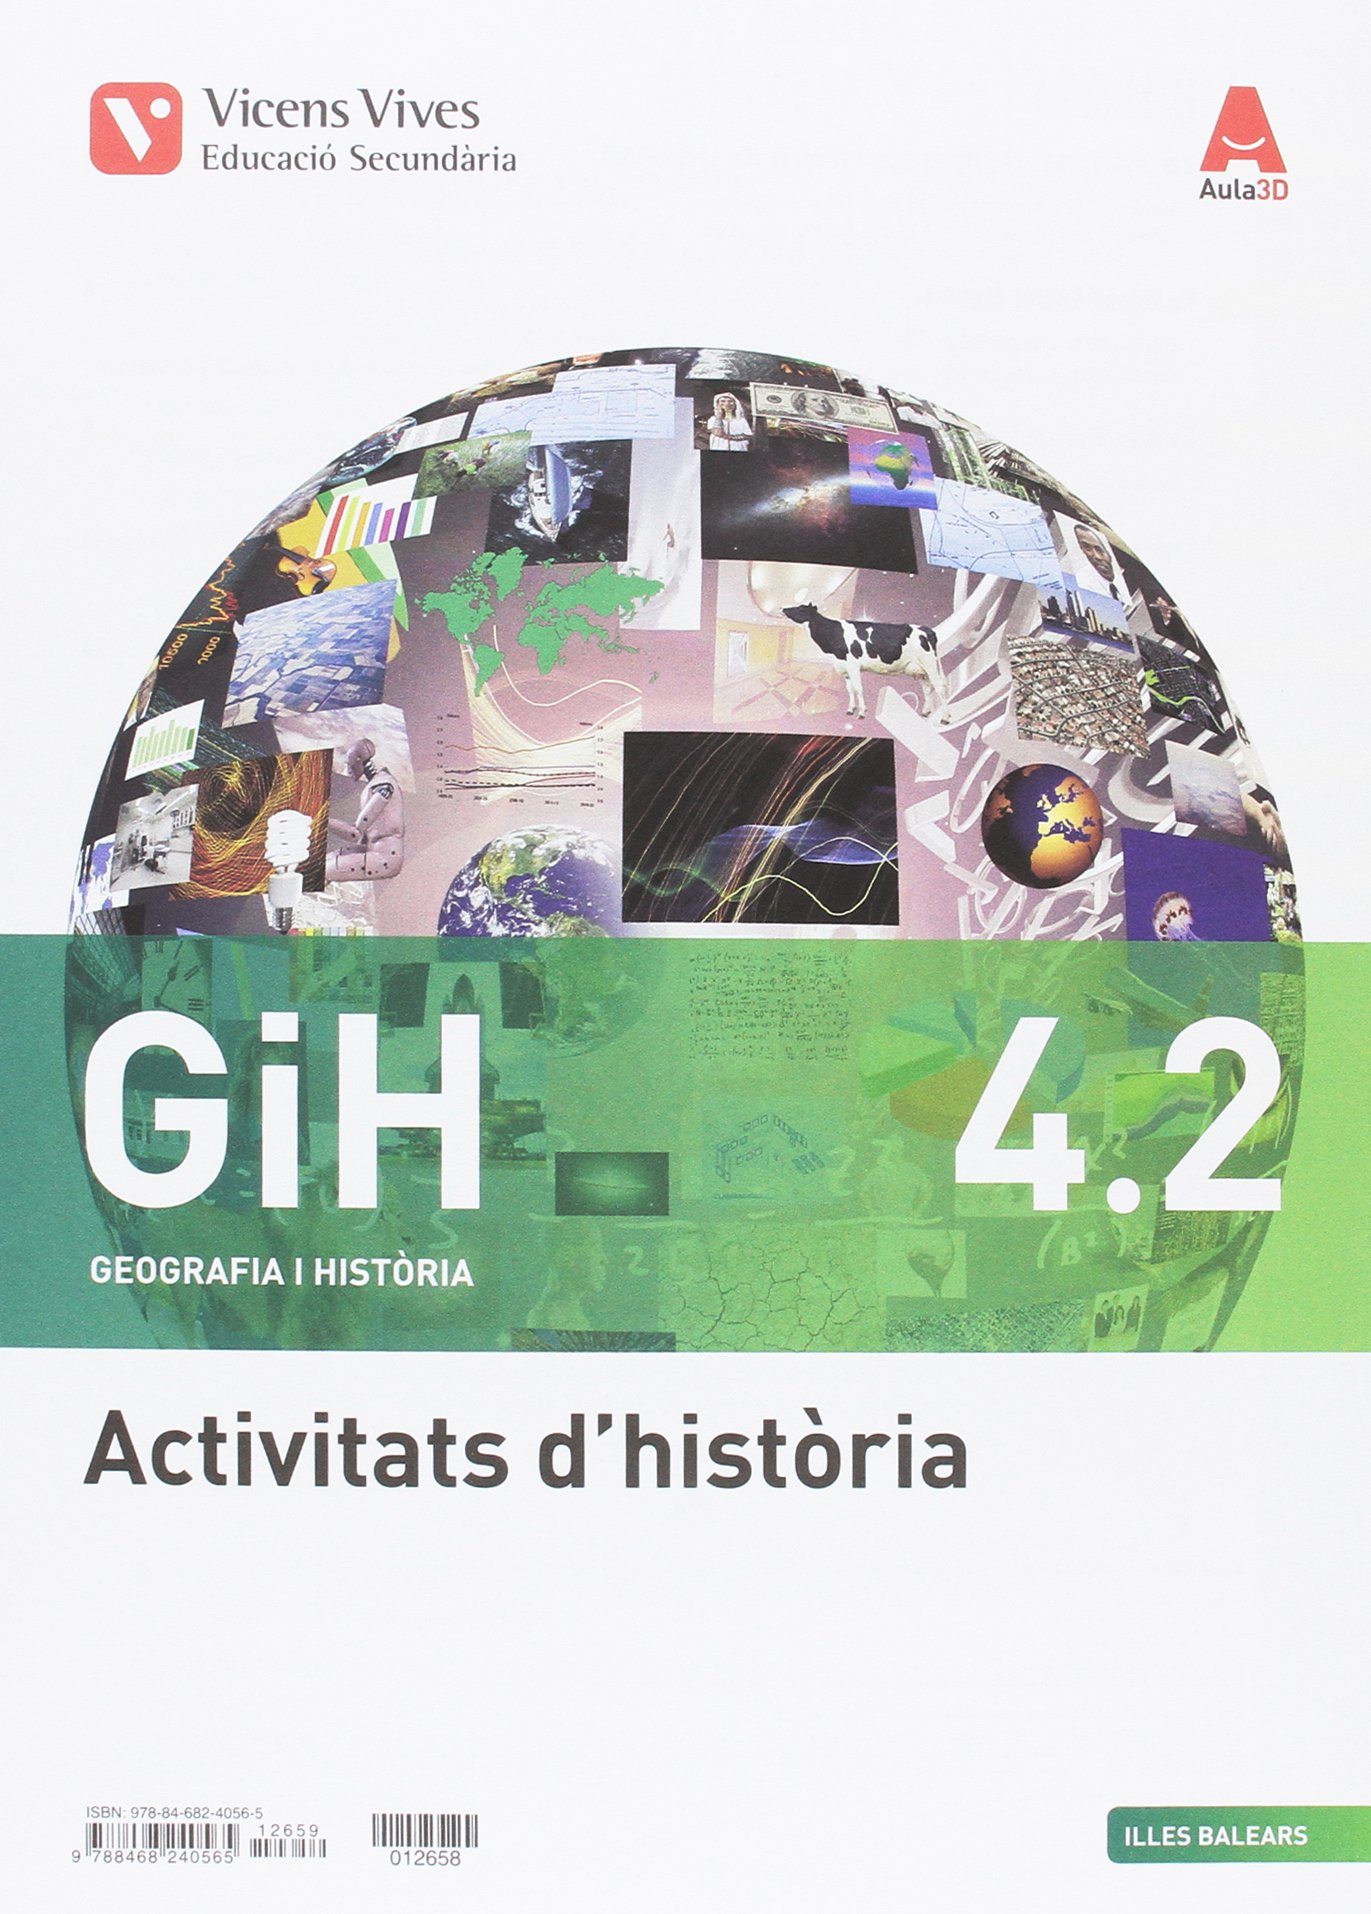 GIH 4 4.1-4.2 BALEARS HISTORIA ACTIVITATS: 000002 - 9788468240565: Amazon.es: M. Masó: Libros